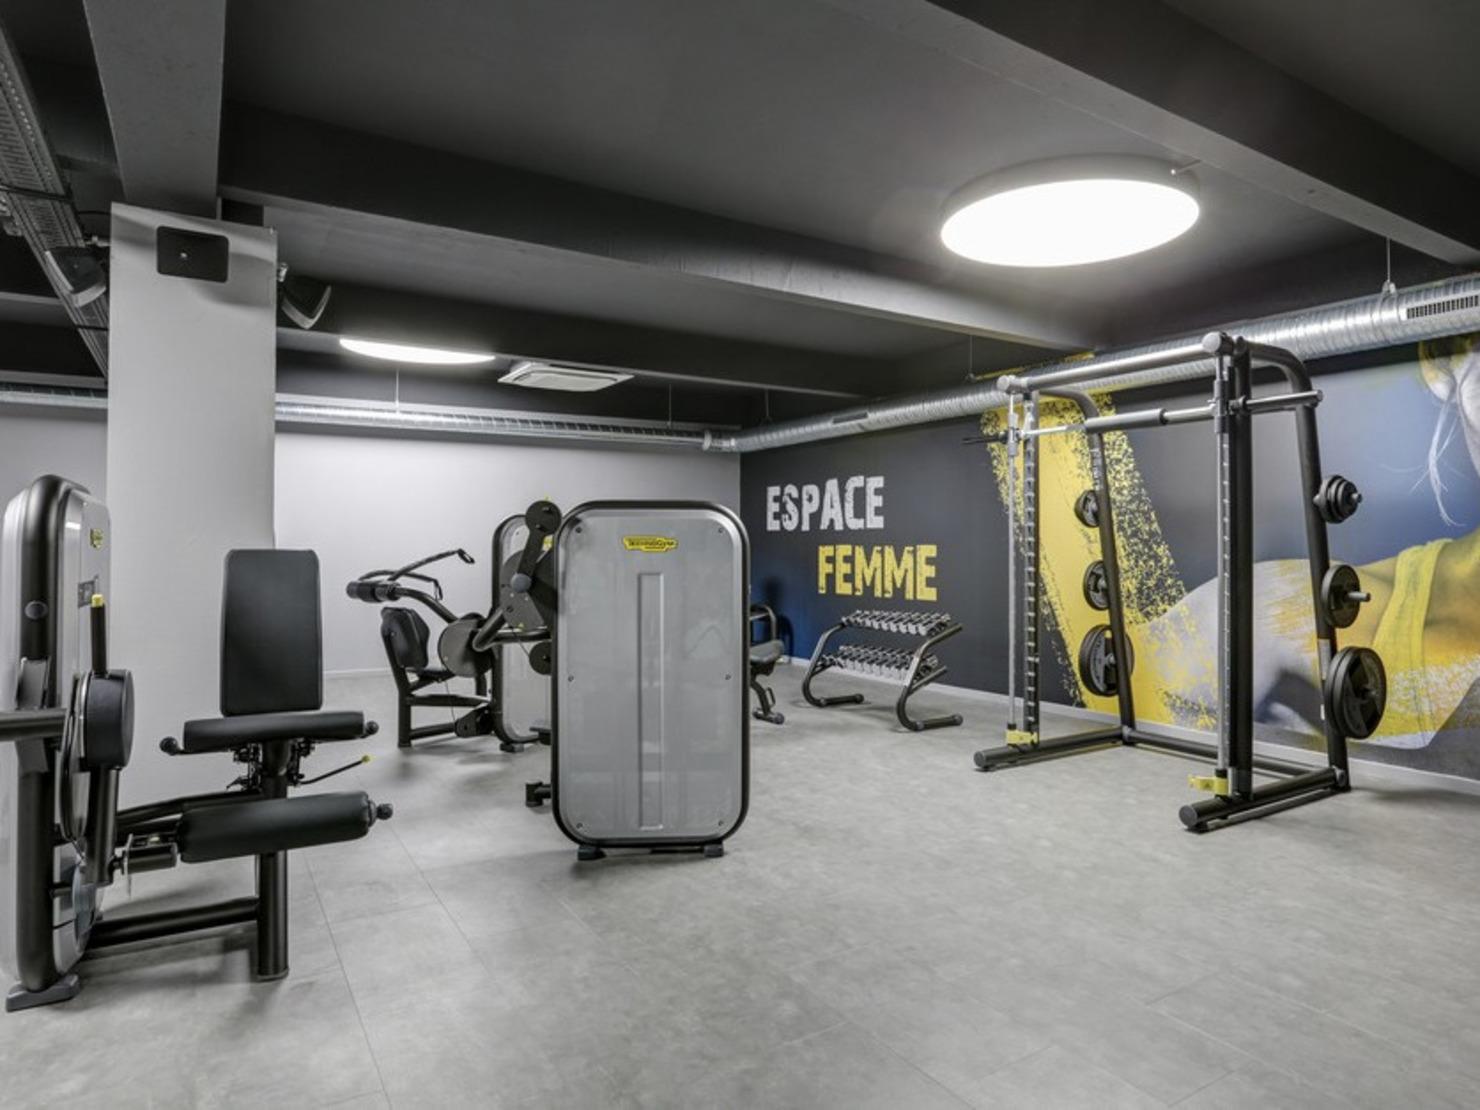 fitness park vitry vitry sur seine tarifs avis horaires essai gratuit. Black Bedroom Furniture Sets. Home Design Ideas